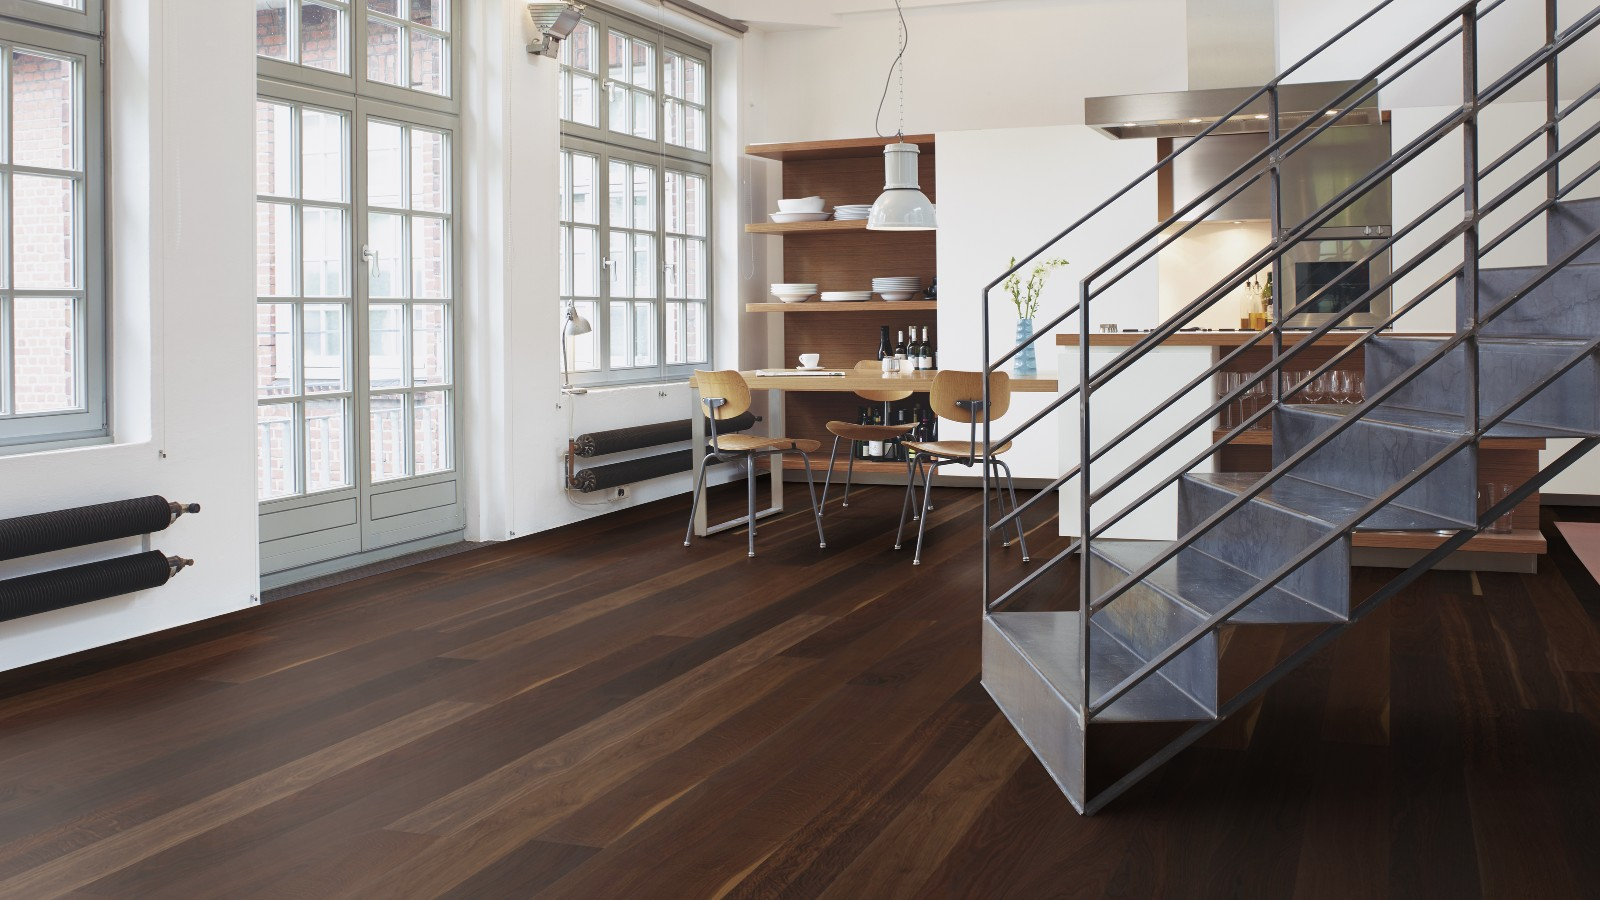 mattlack parkett online kaufen daedelow parkett. Black Bedroom Furniture Sets. Home Design Ideas